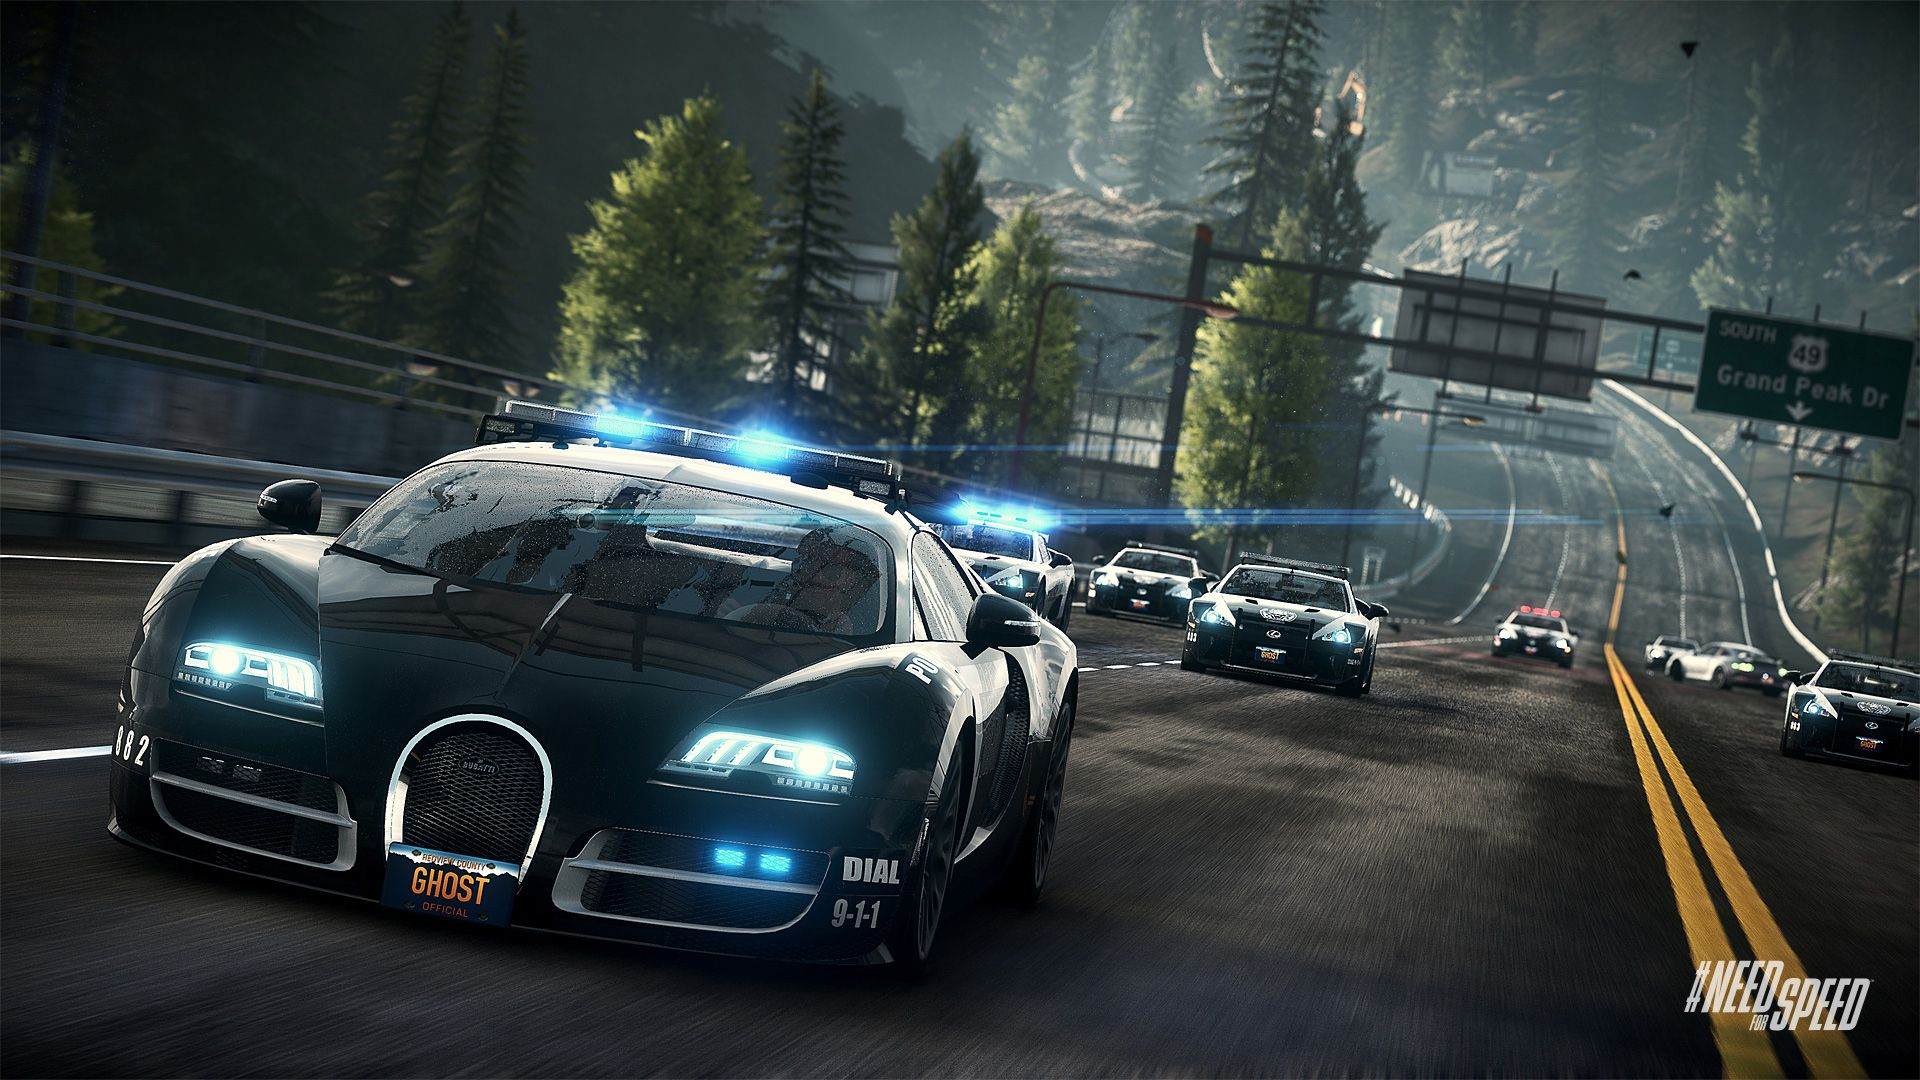 Nfs Rivals Bugatti Veyron Alldrive 2 1920 Jpg 1920 1080 Need For Speed Rivals Need For Speed Need For Speed Movie